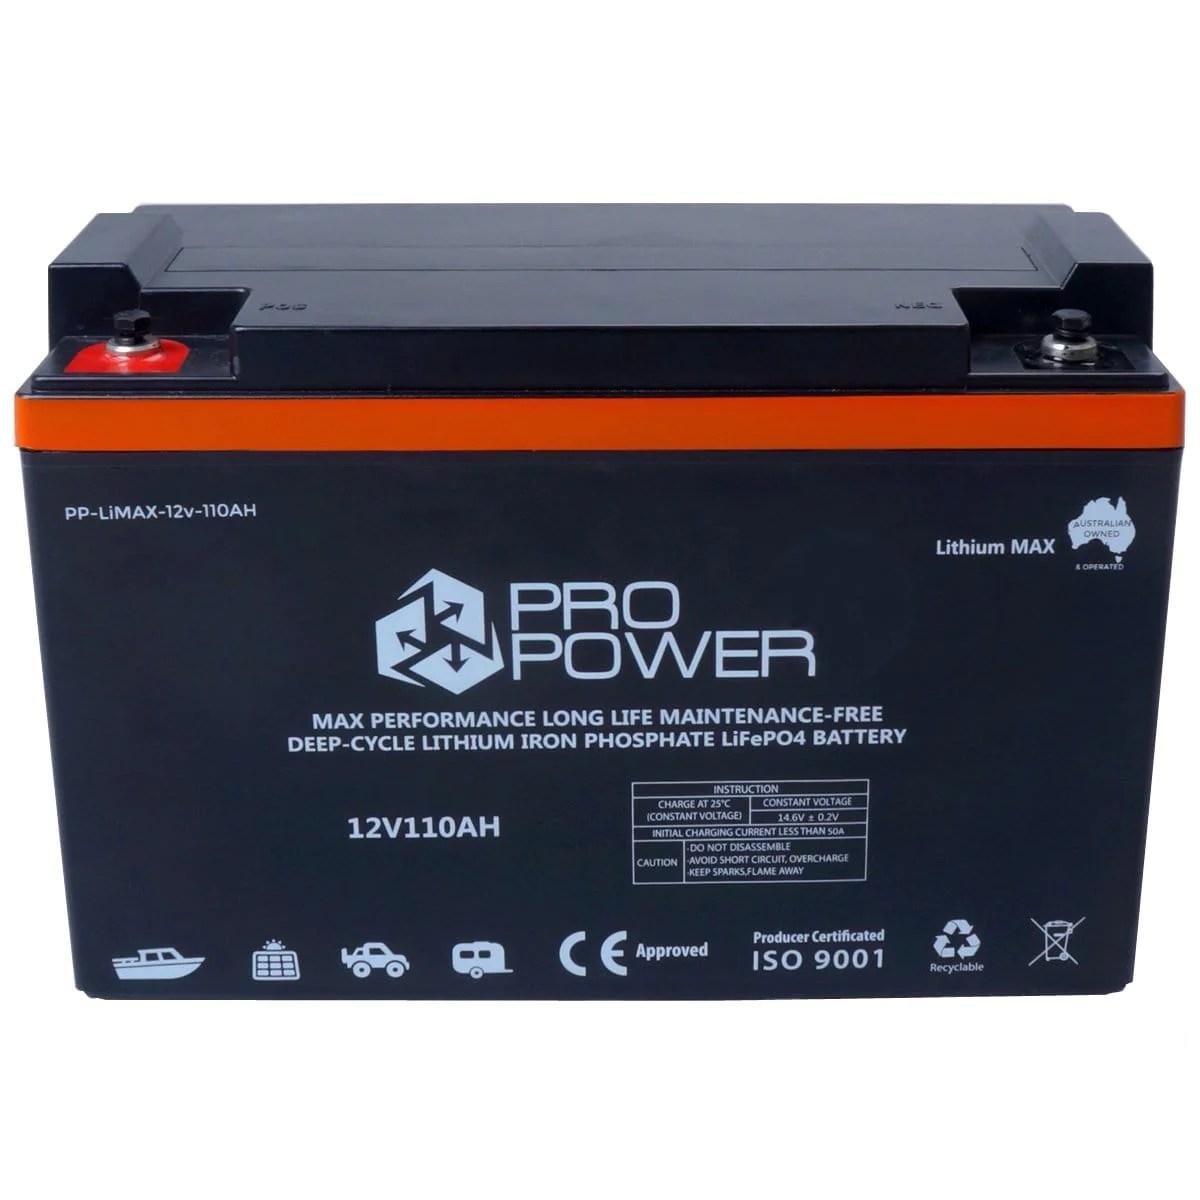 pro power 12v 110ah lithium iron lifepo4 deep cycle battery solar 4wd caravan [ 1200 x 1200 Pixel ]